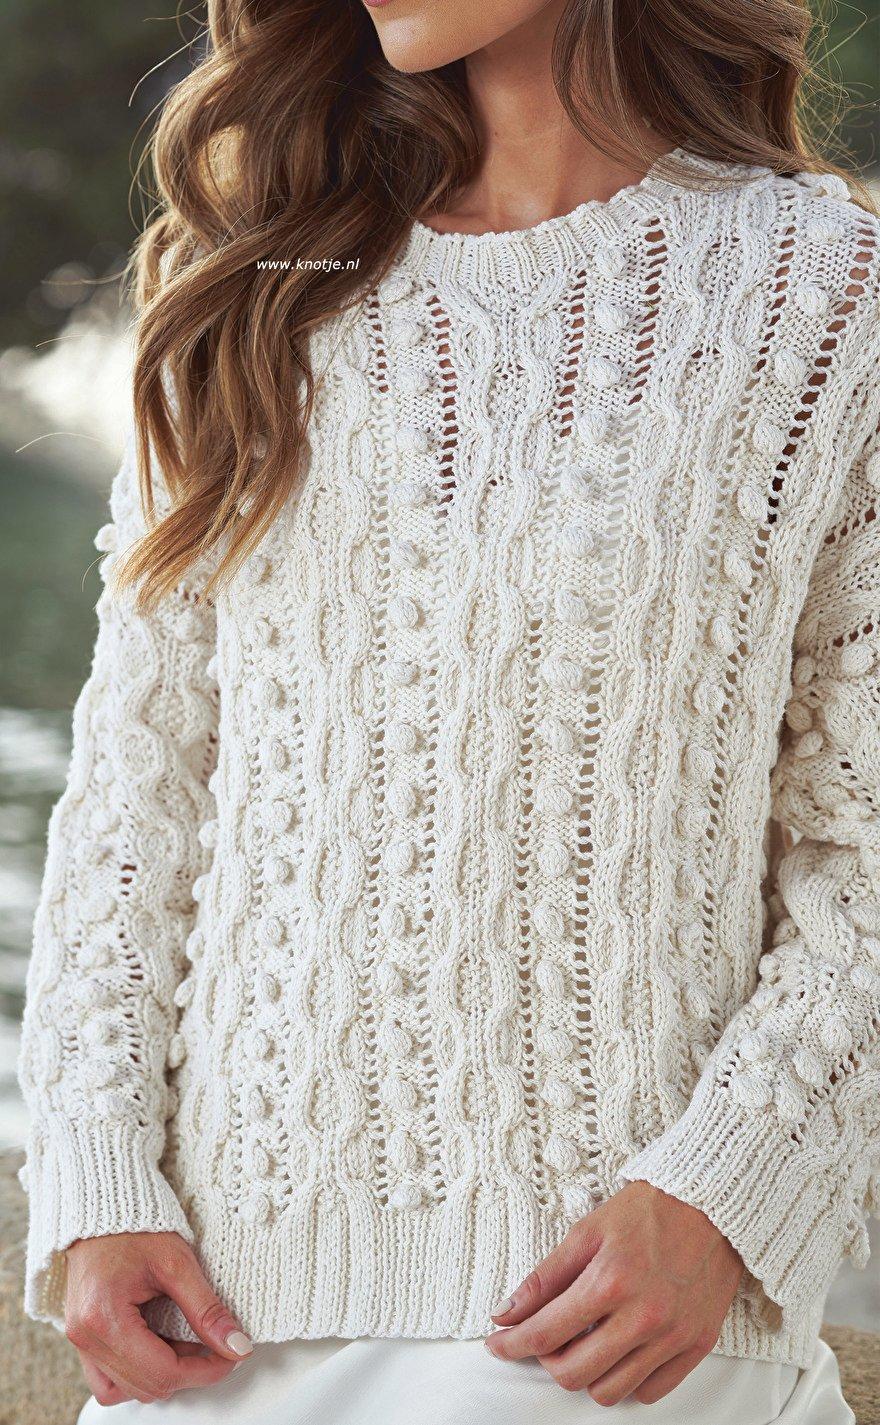 009 cable bobble sweater 2kopie.jpg